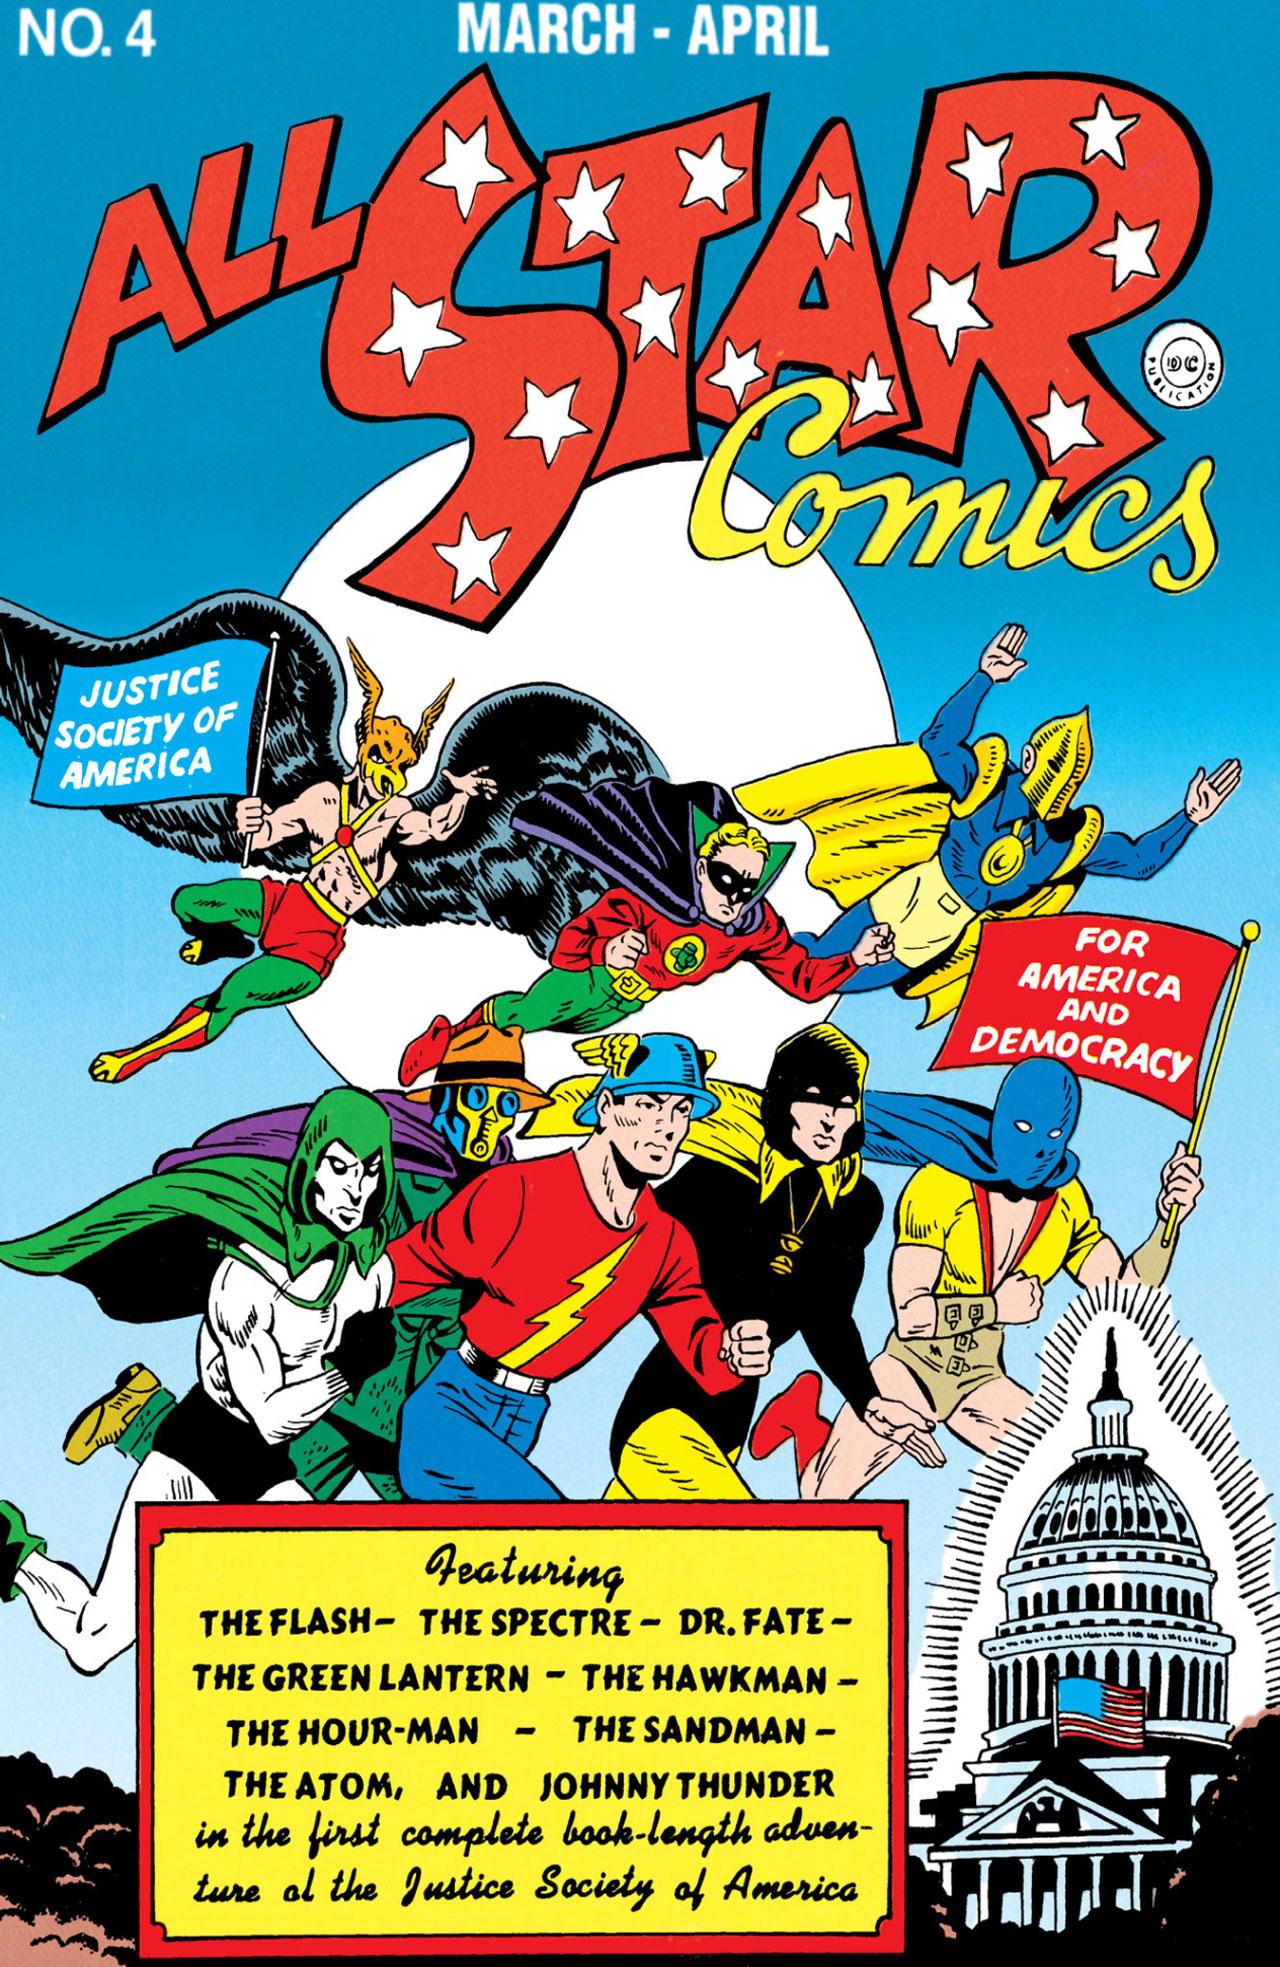 All-Star-Comics.jpg